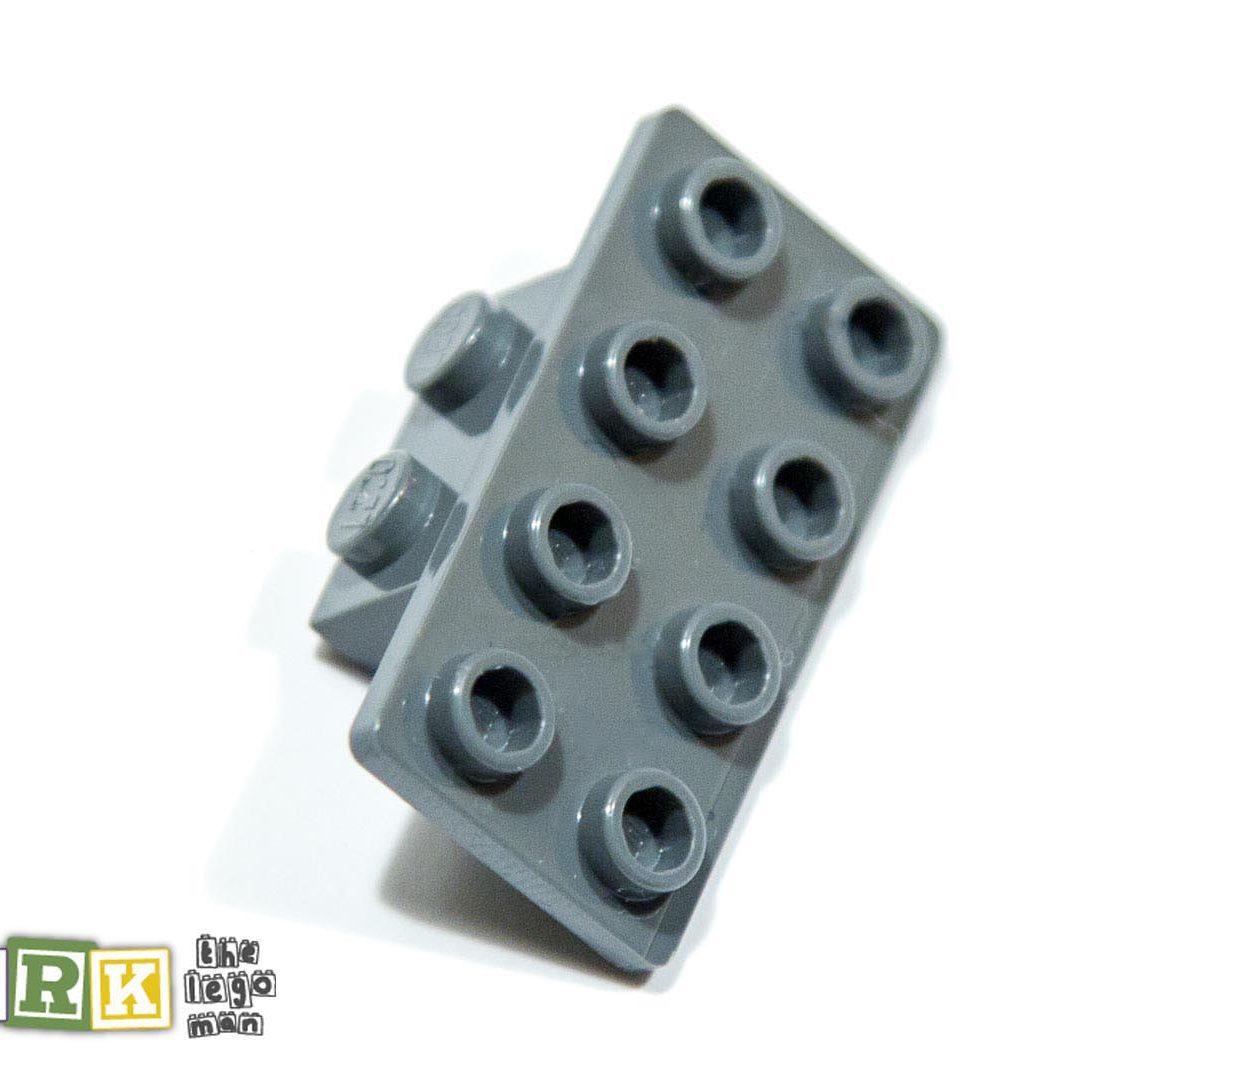 Lego 4648067 93274 1x Dark Blueish Grey Dark Stone Dark Standard Grey 1x2 2x4 Angle Plate